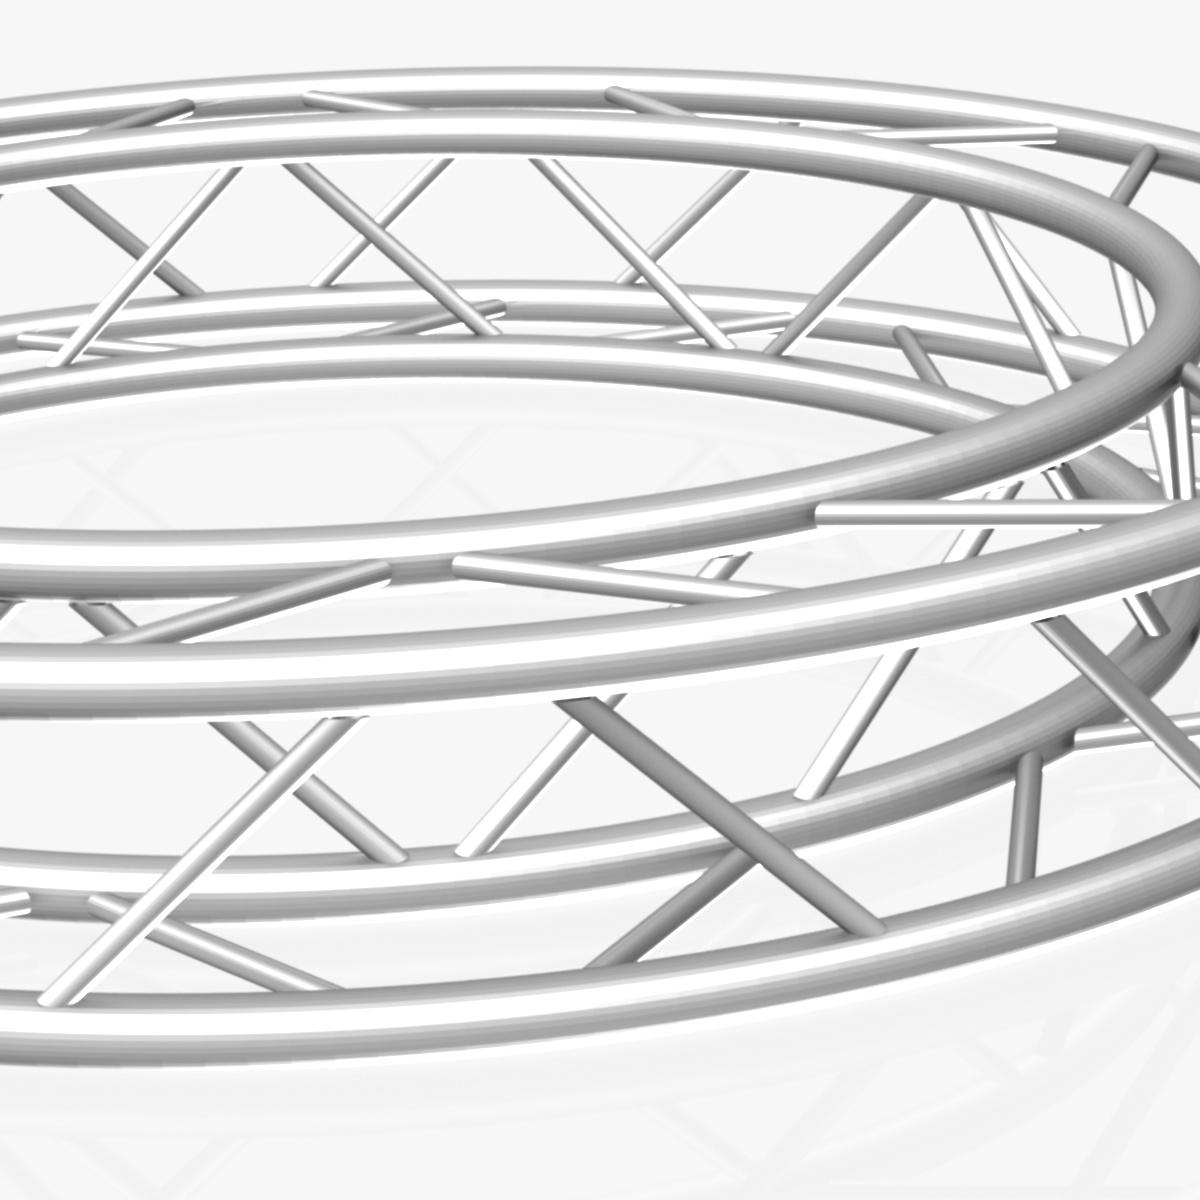 дугуй дөрвөлжин Дотоод (бүрэн диаметр 200cm) 3d загвар 3ds max dxf fbx c4d dae obj 252361